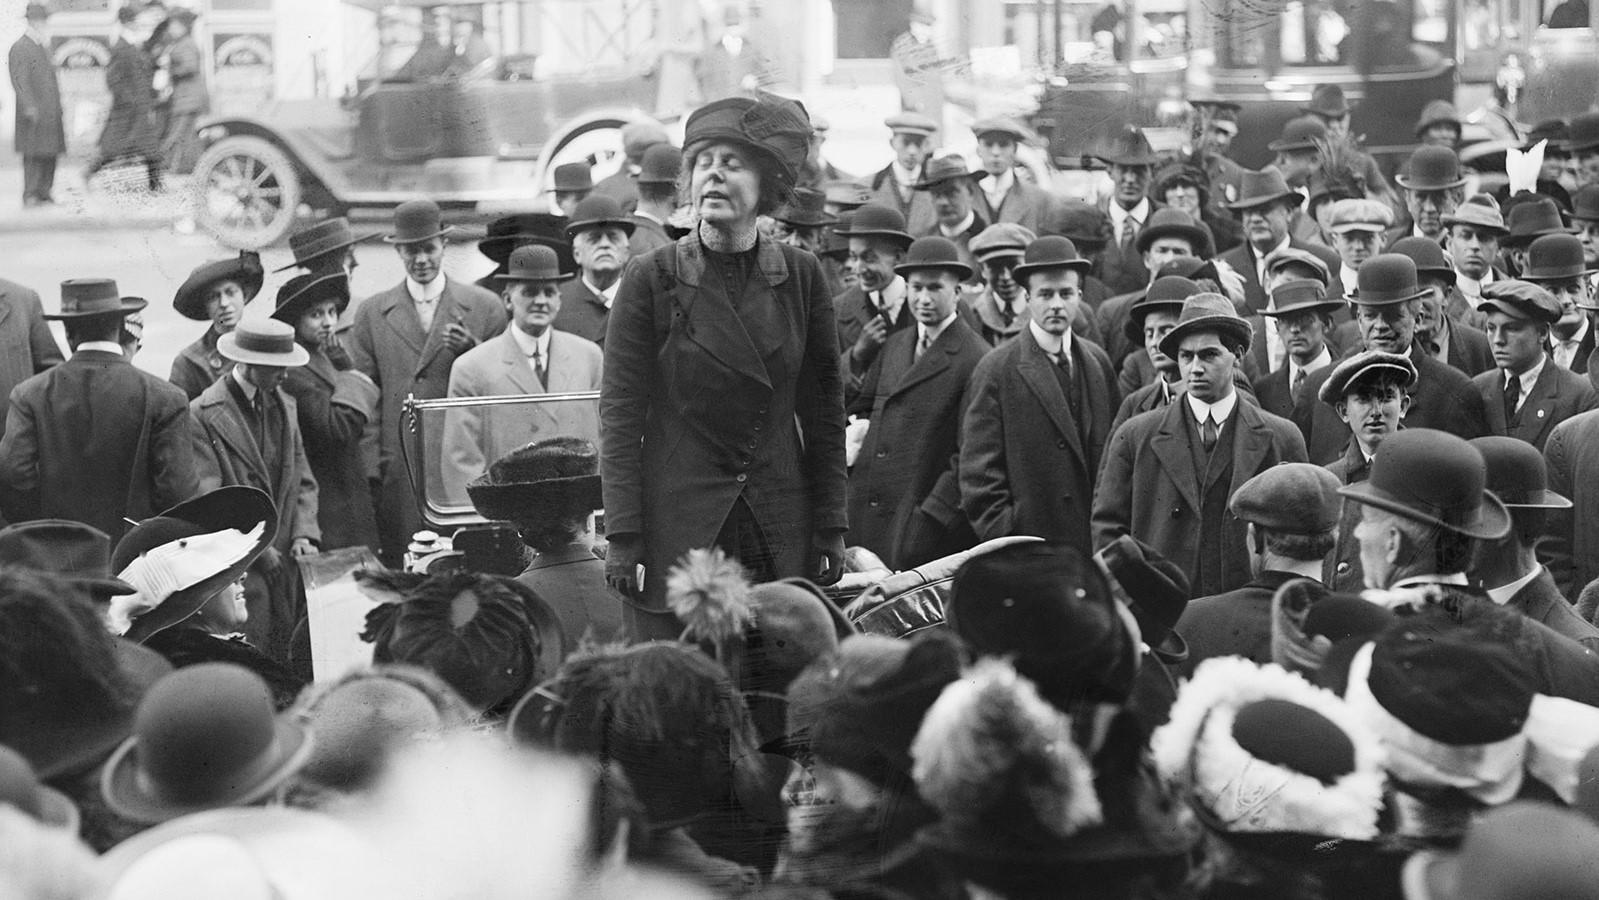 Lucy Burns speaking on behalf of women's suffrage in 1915 LOC